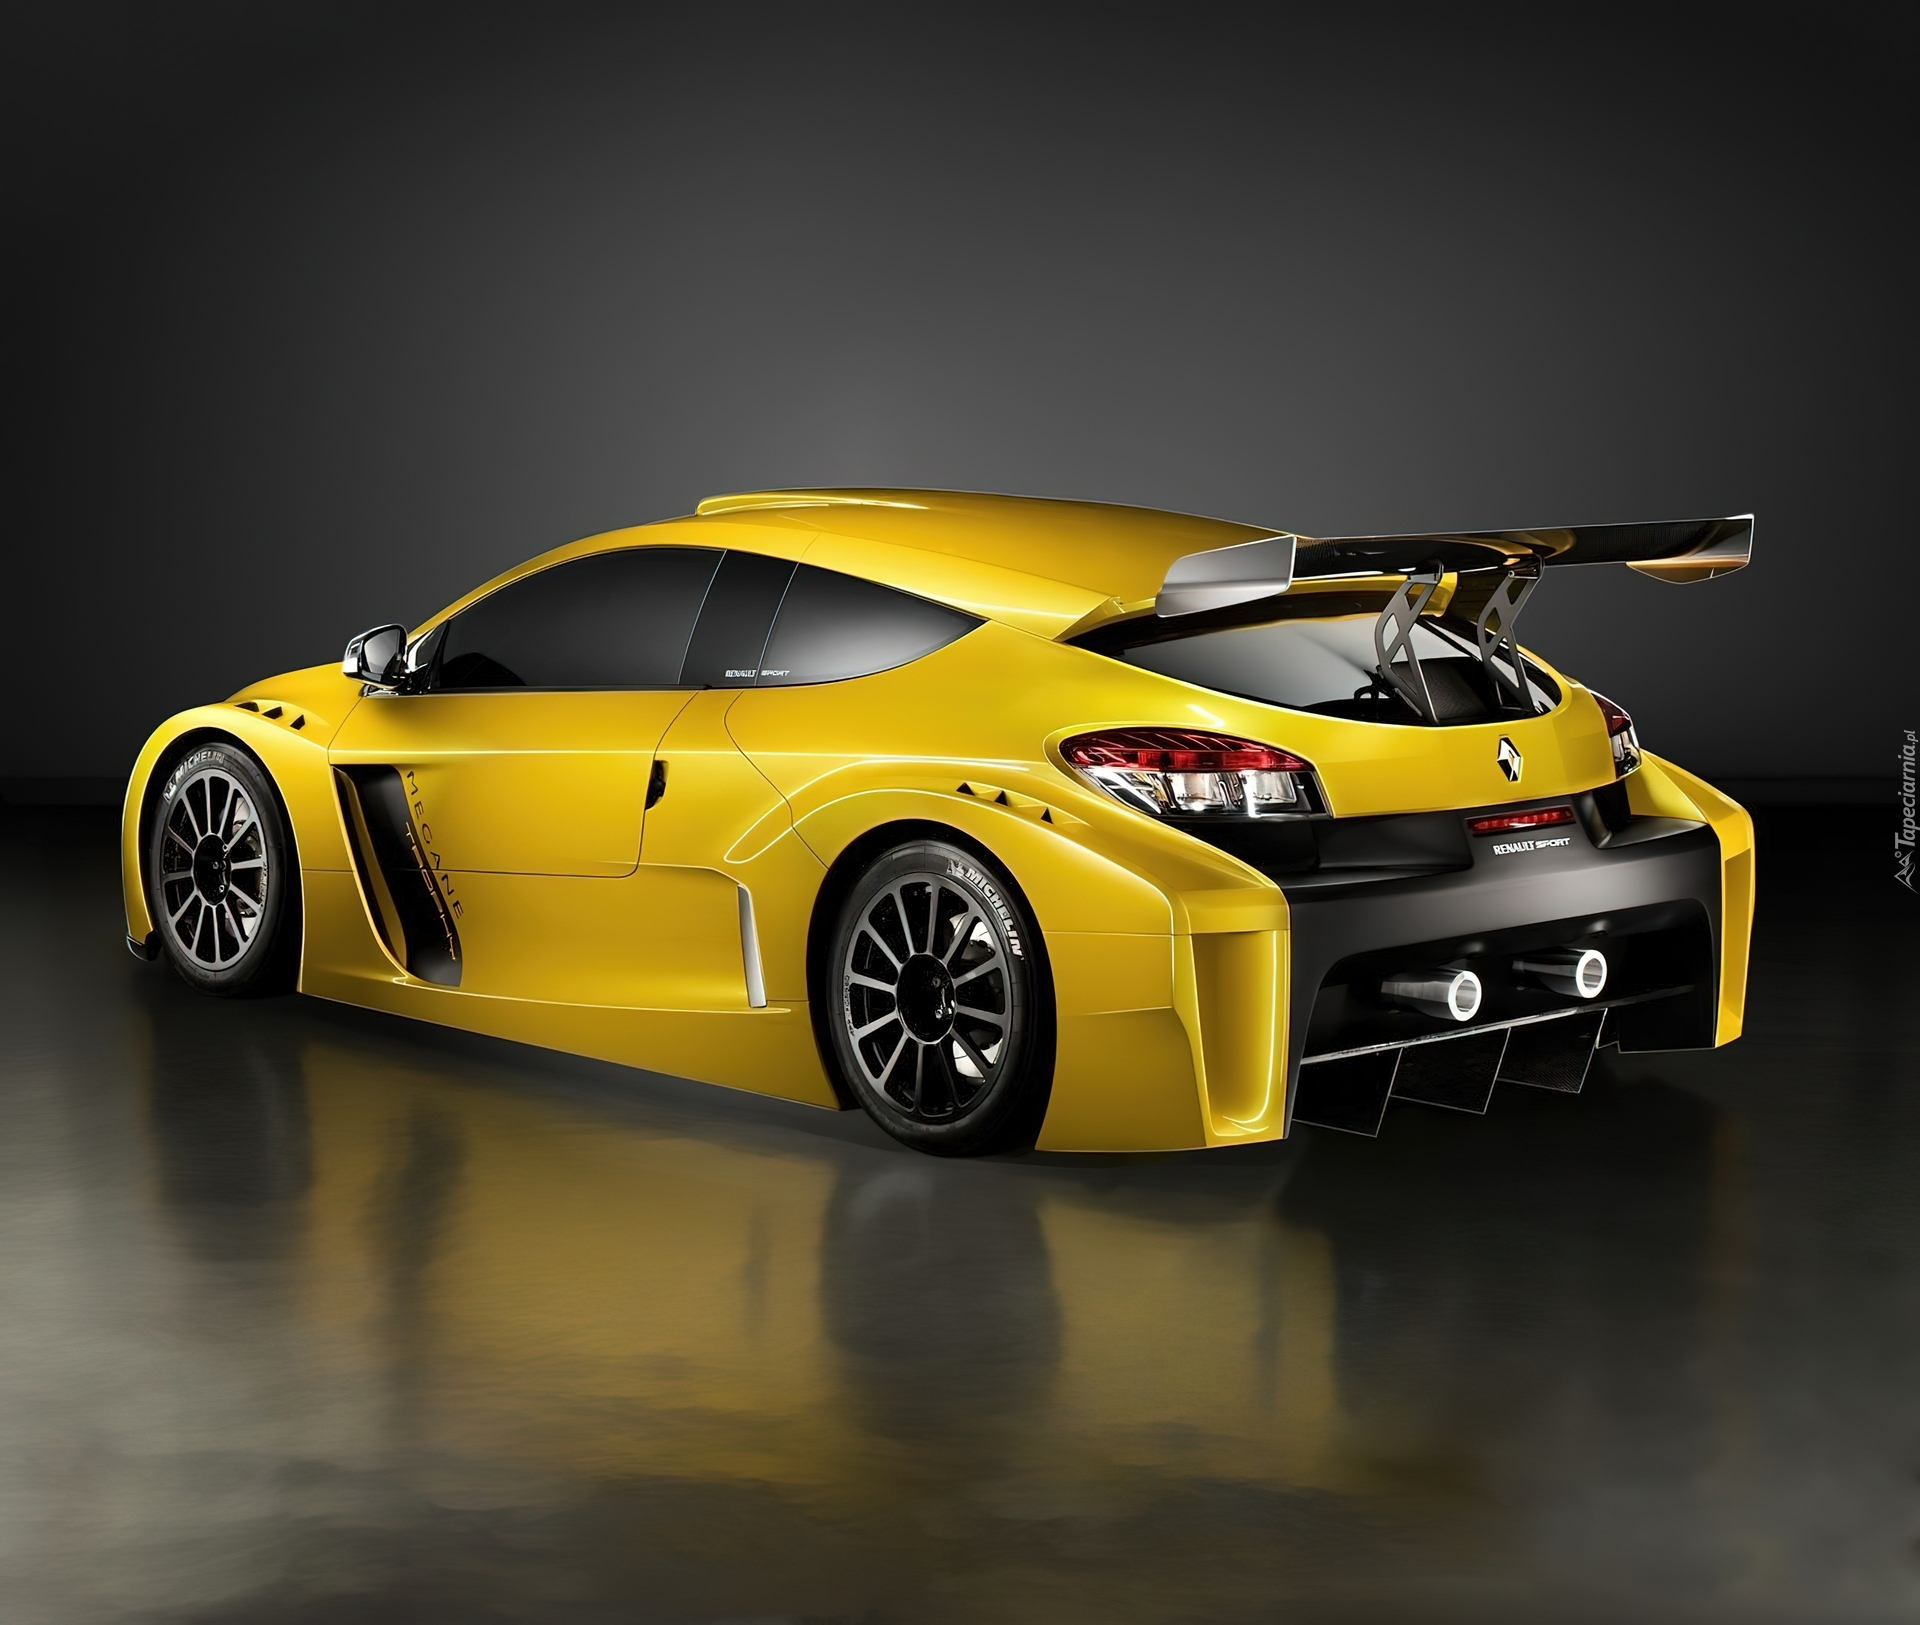 Renault Sport: Renault Megane Sport, Wirtualny, Tuning